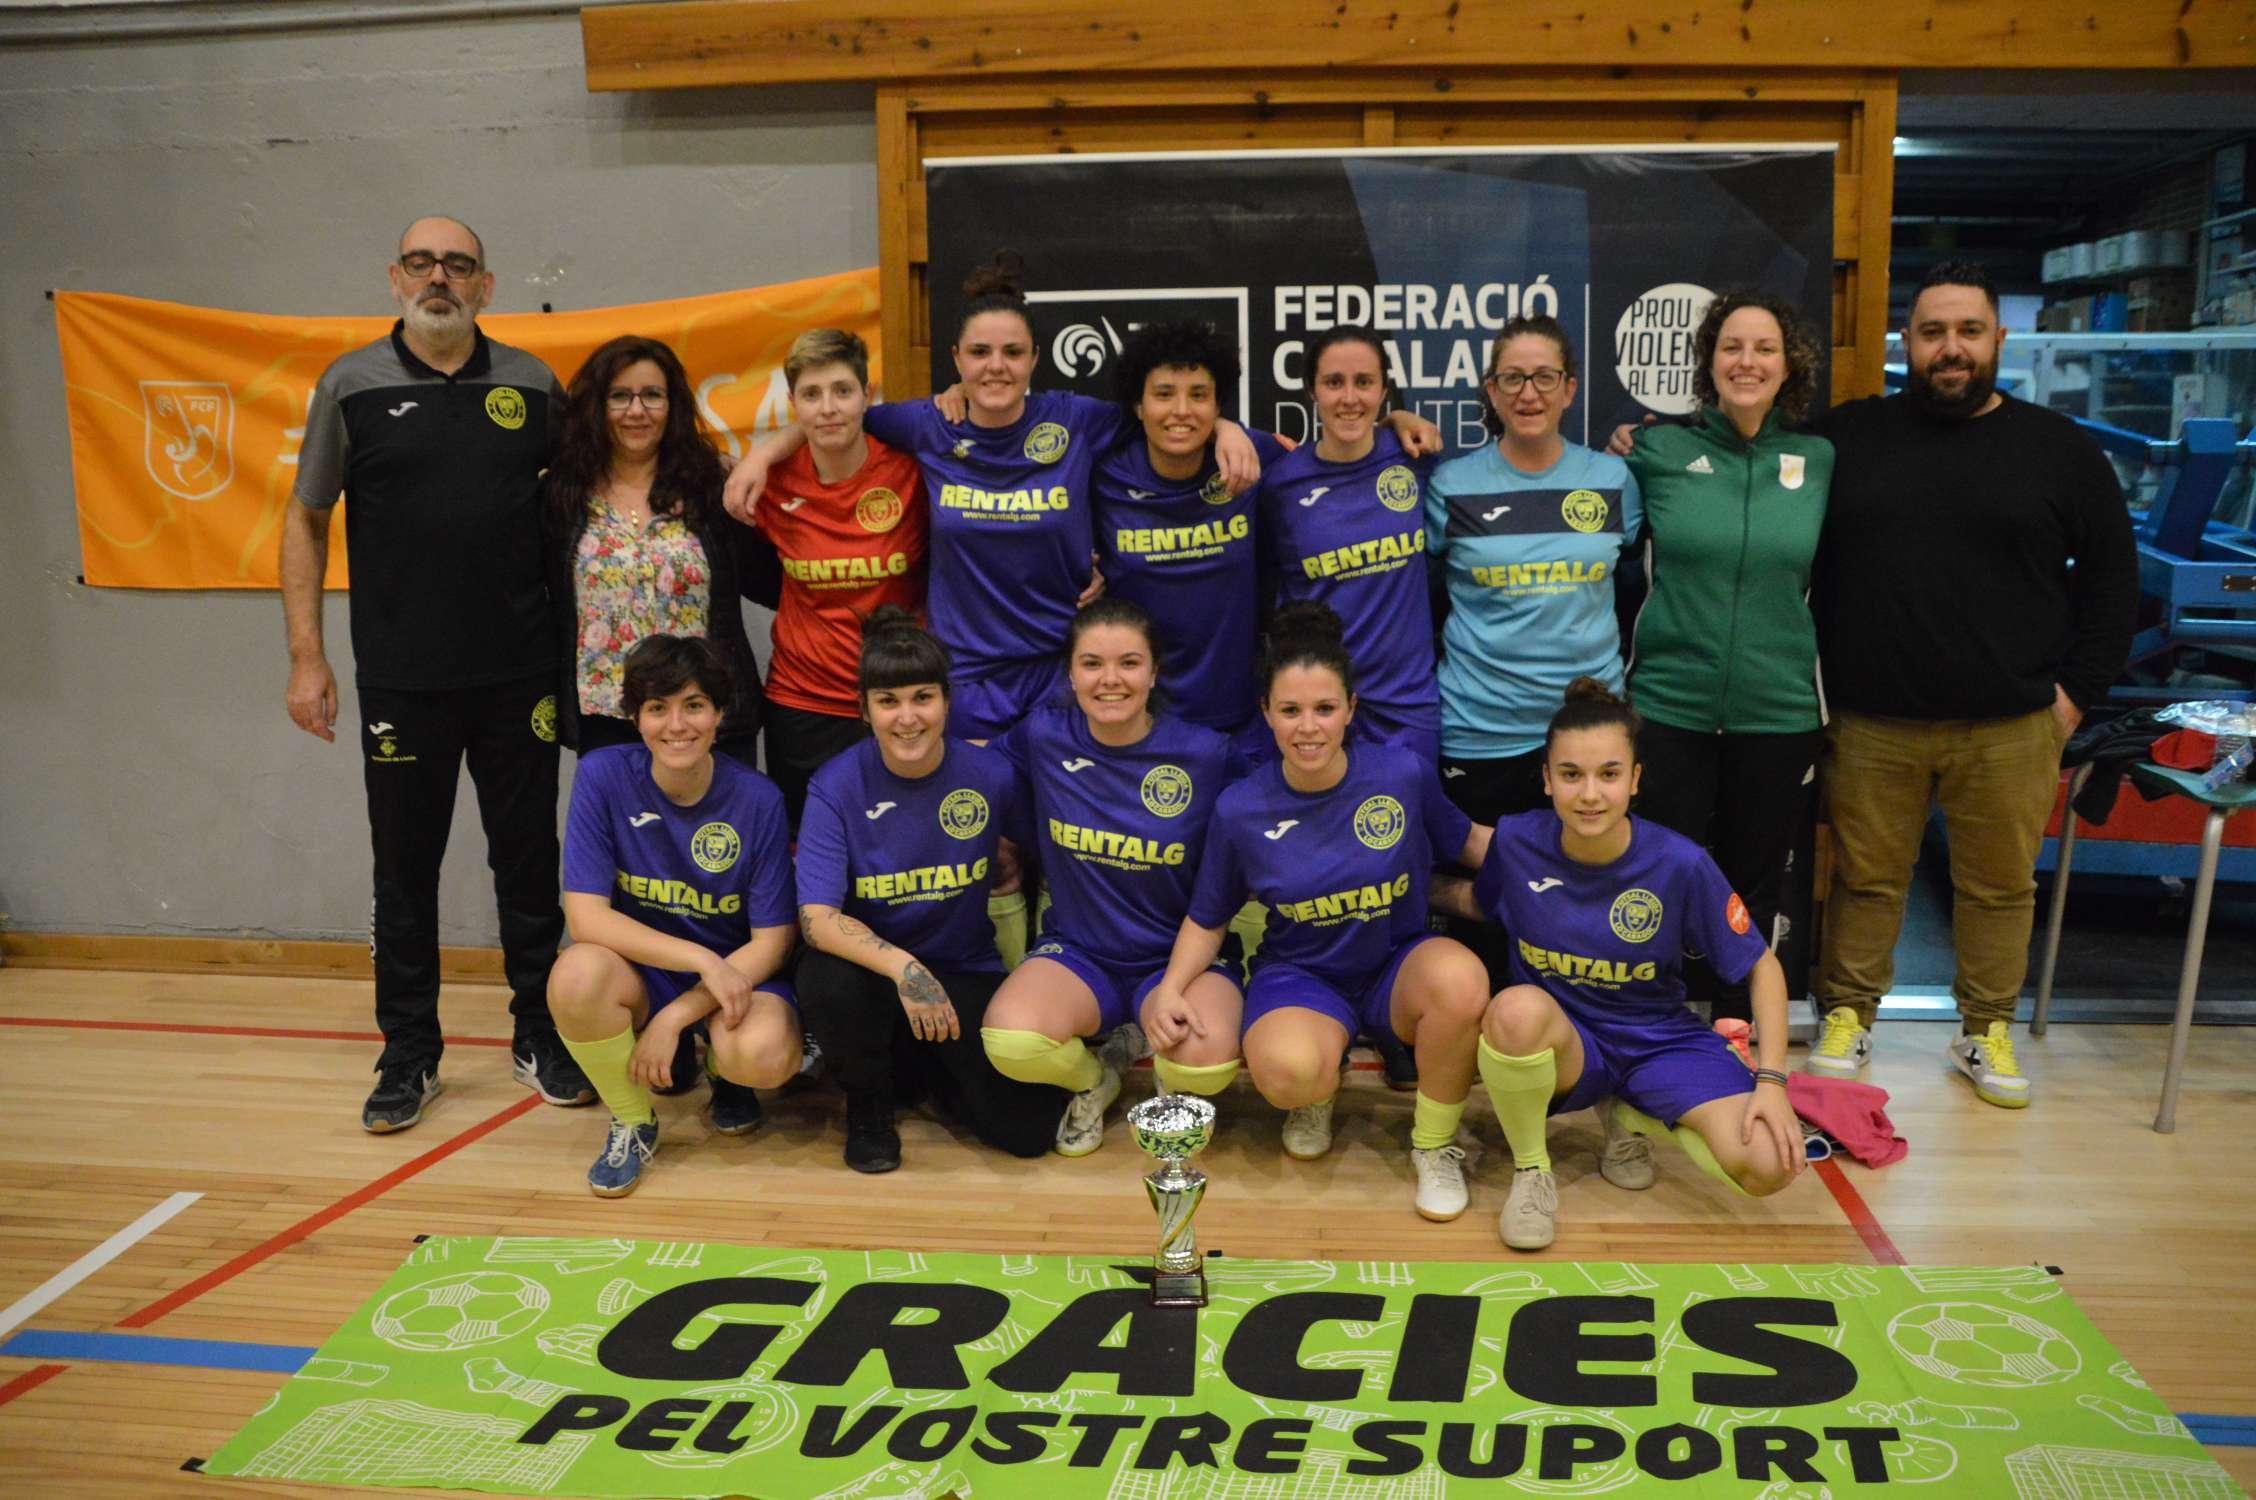 Campiones Sènior femení Copa Lleida - Rentalg Futsal Lleida (Clàudia Ramos)